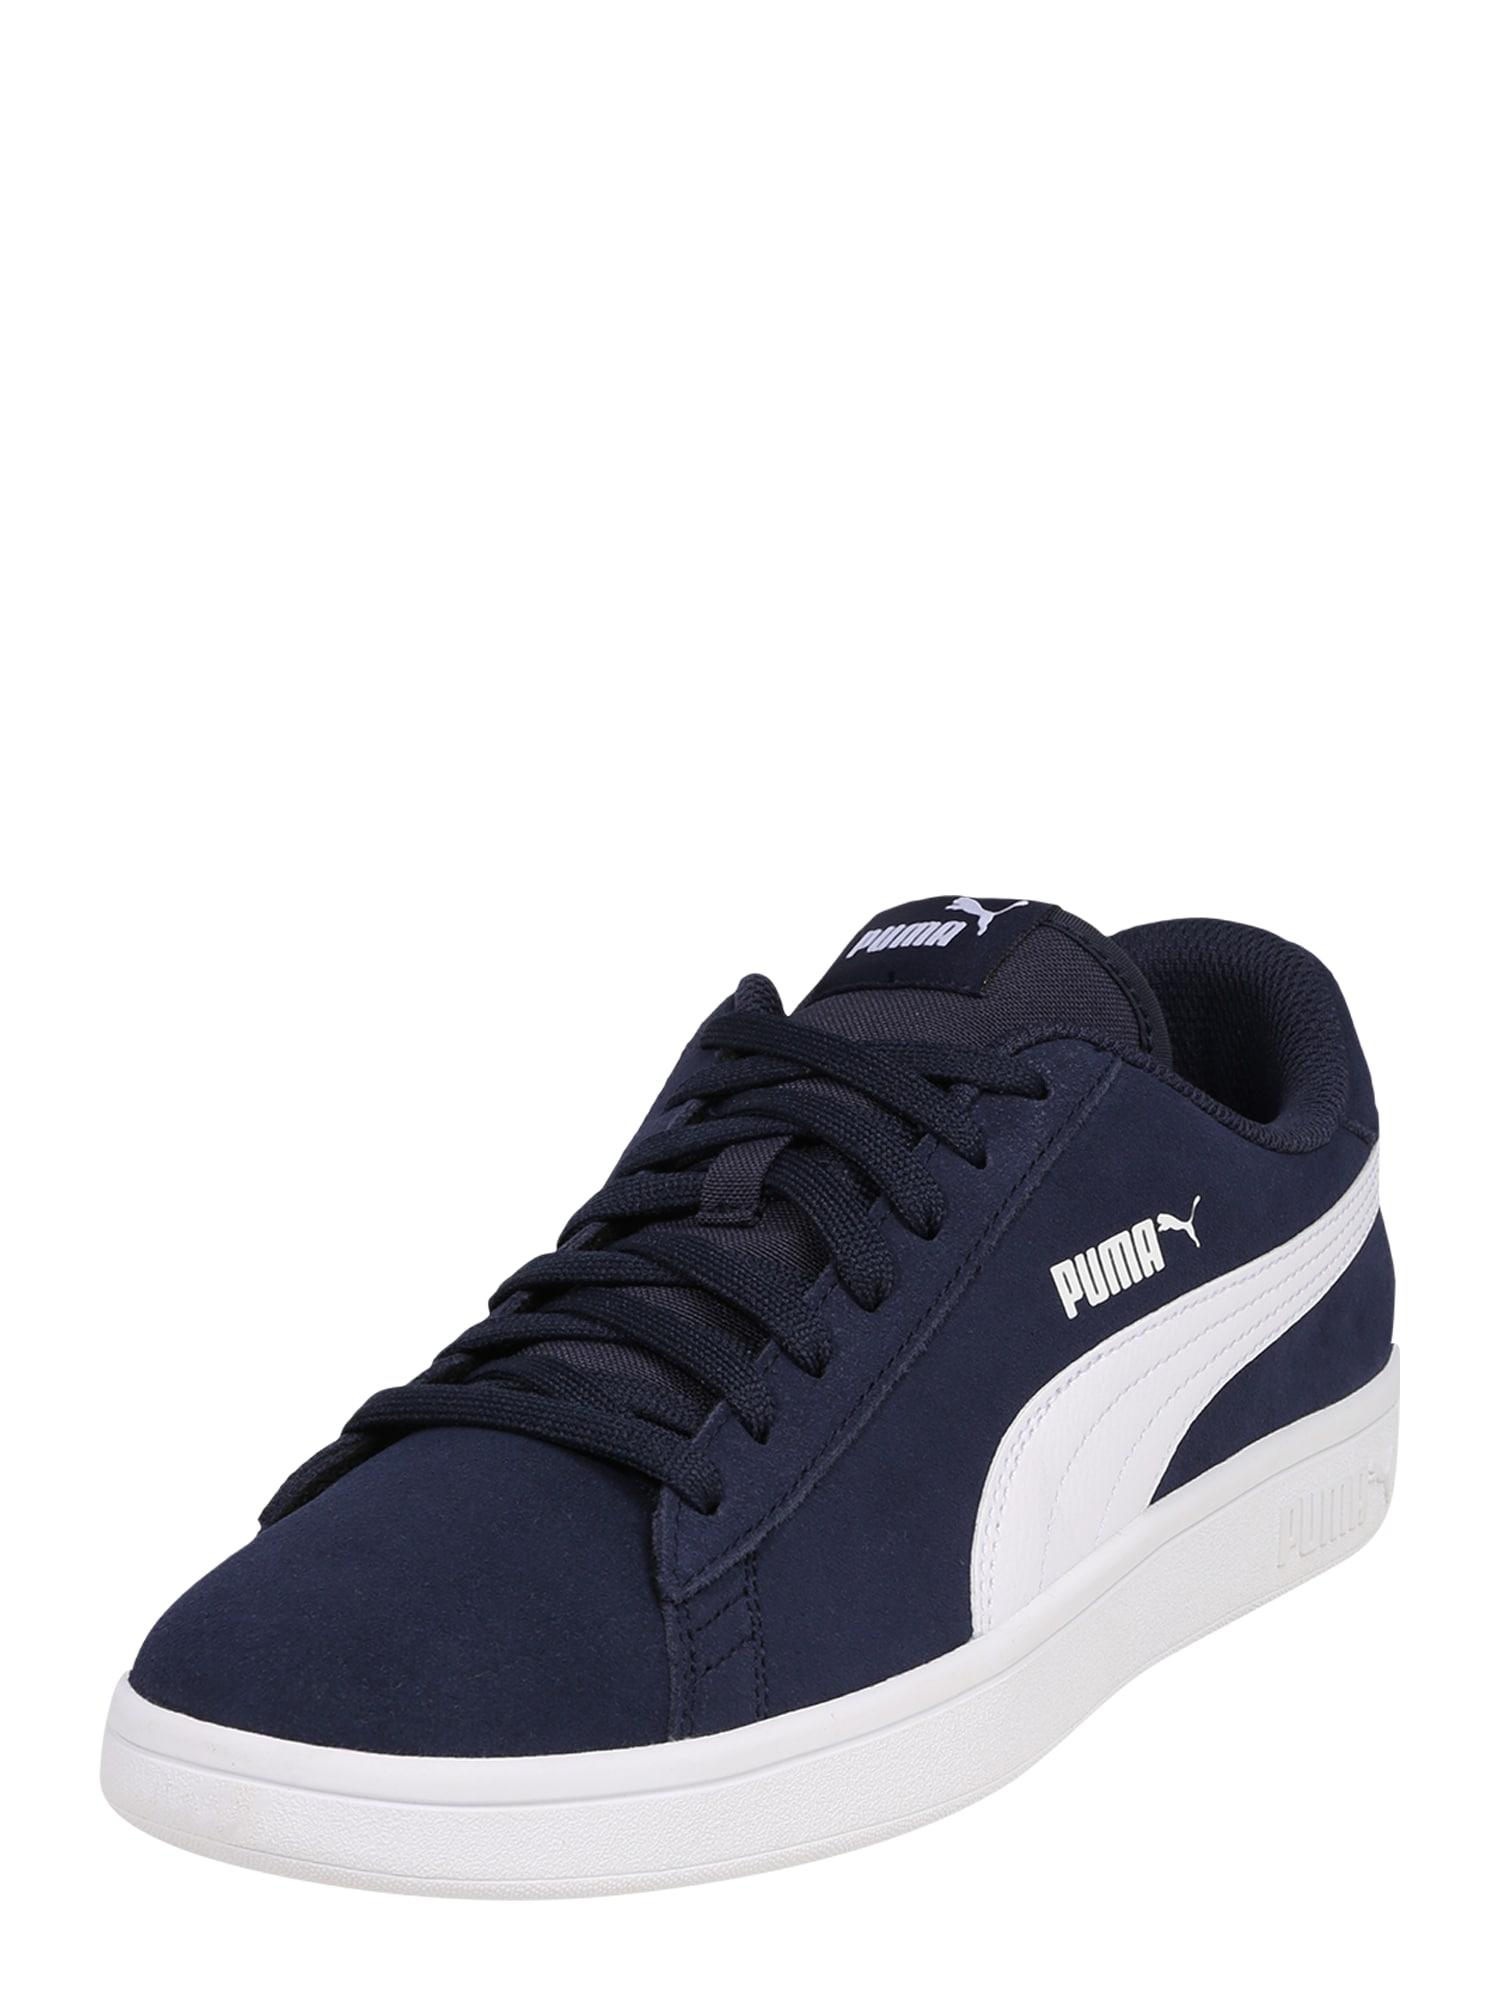 PUMA Sneaker bassa 'Smash V2'  navy male shop the look